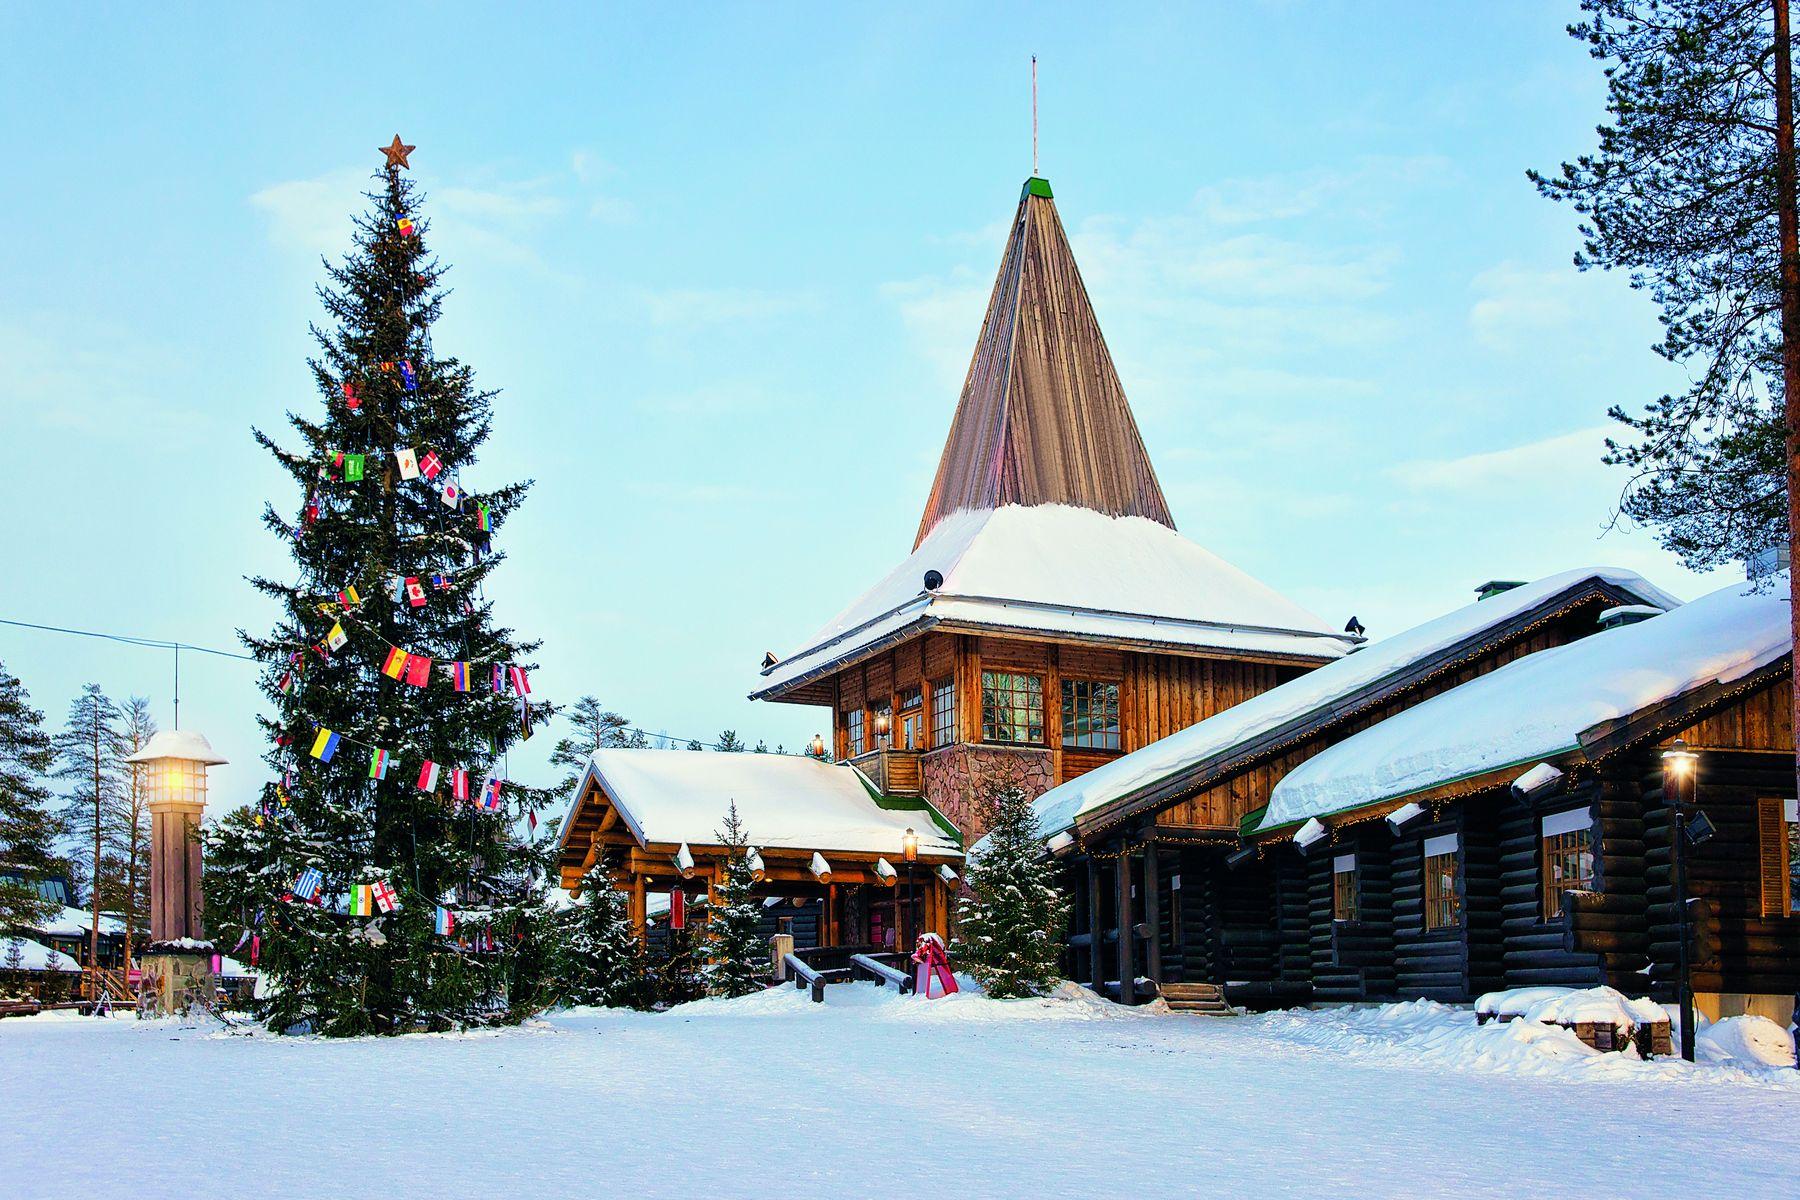 Santa Claus Village Rovaniemi iStock672600774